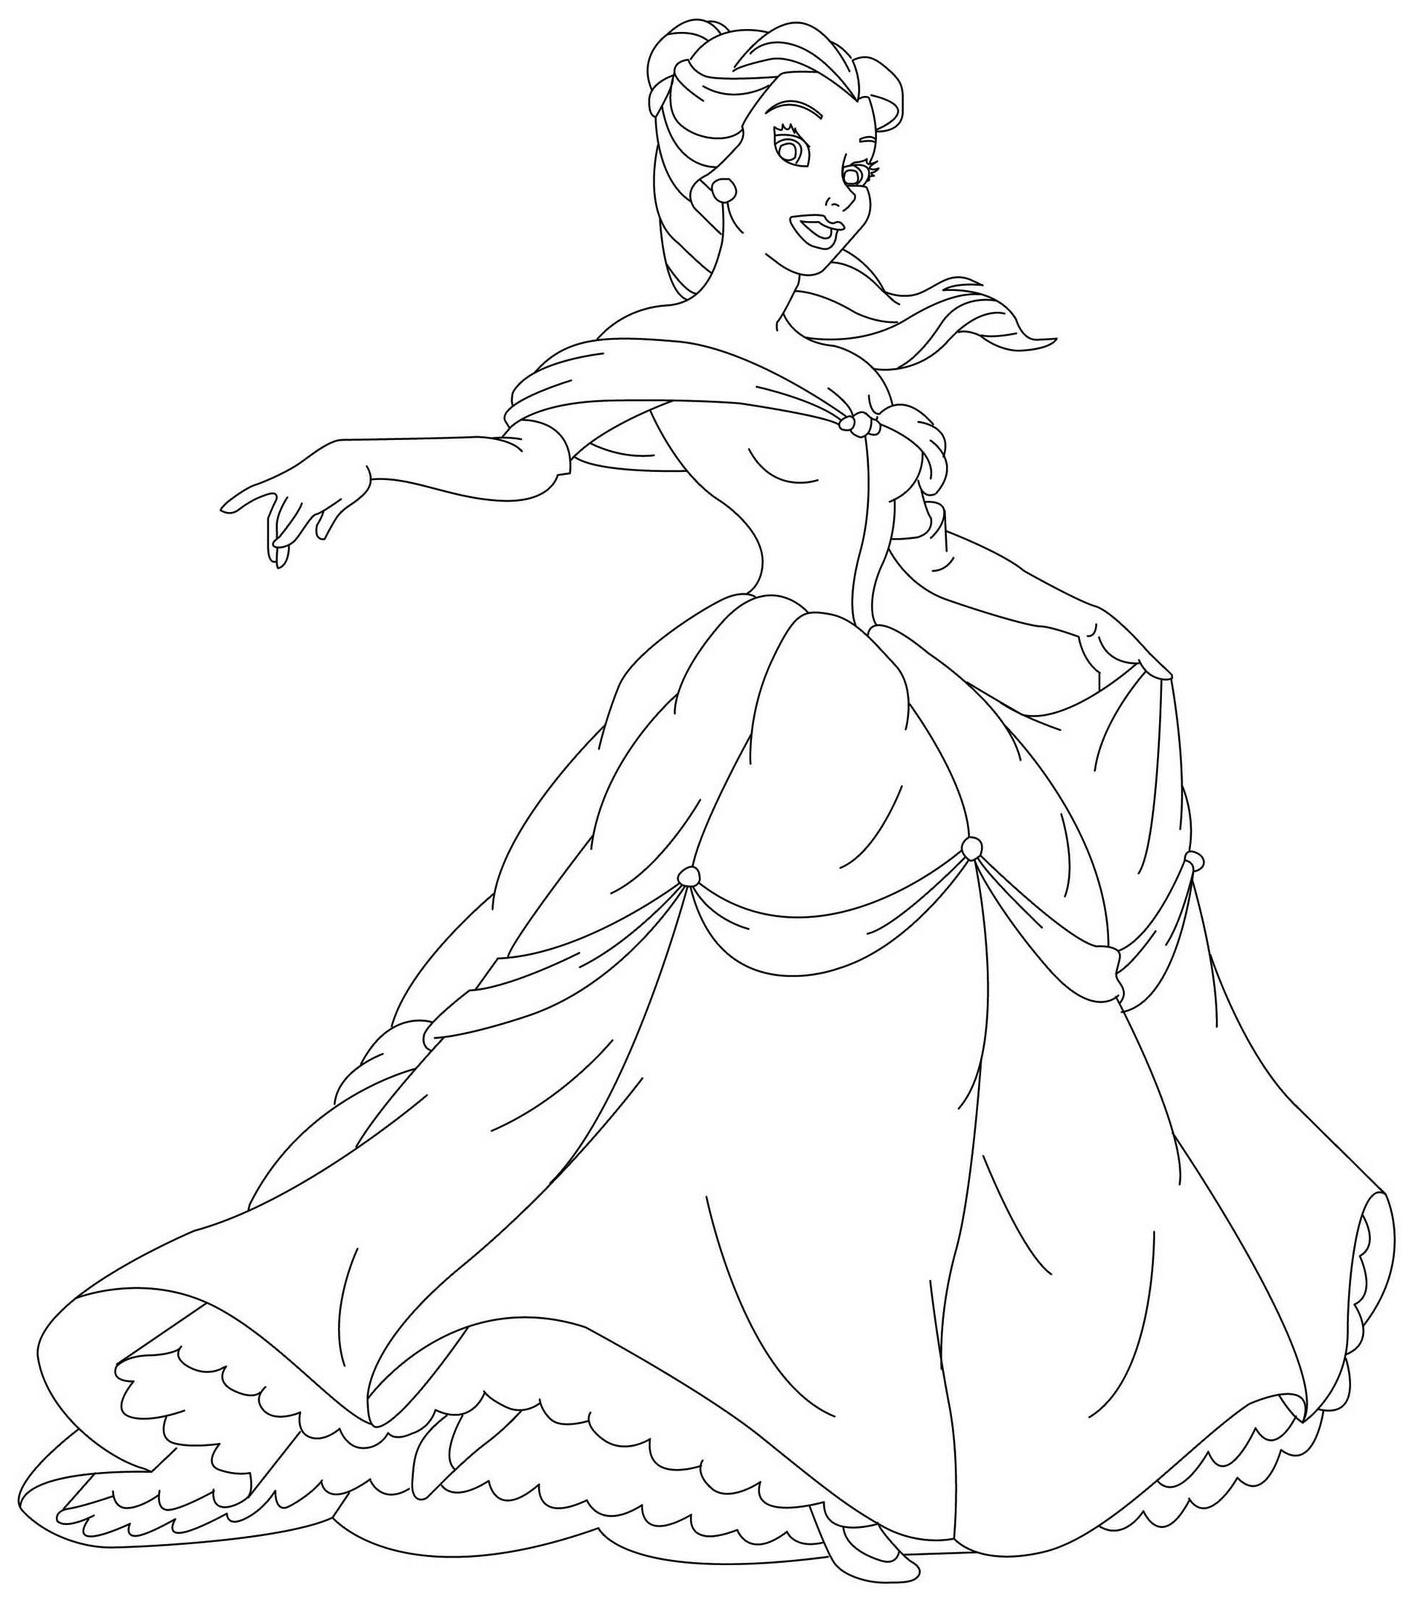 Disney Coloring Pages Princess 3 Free Printable Coloring